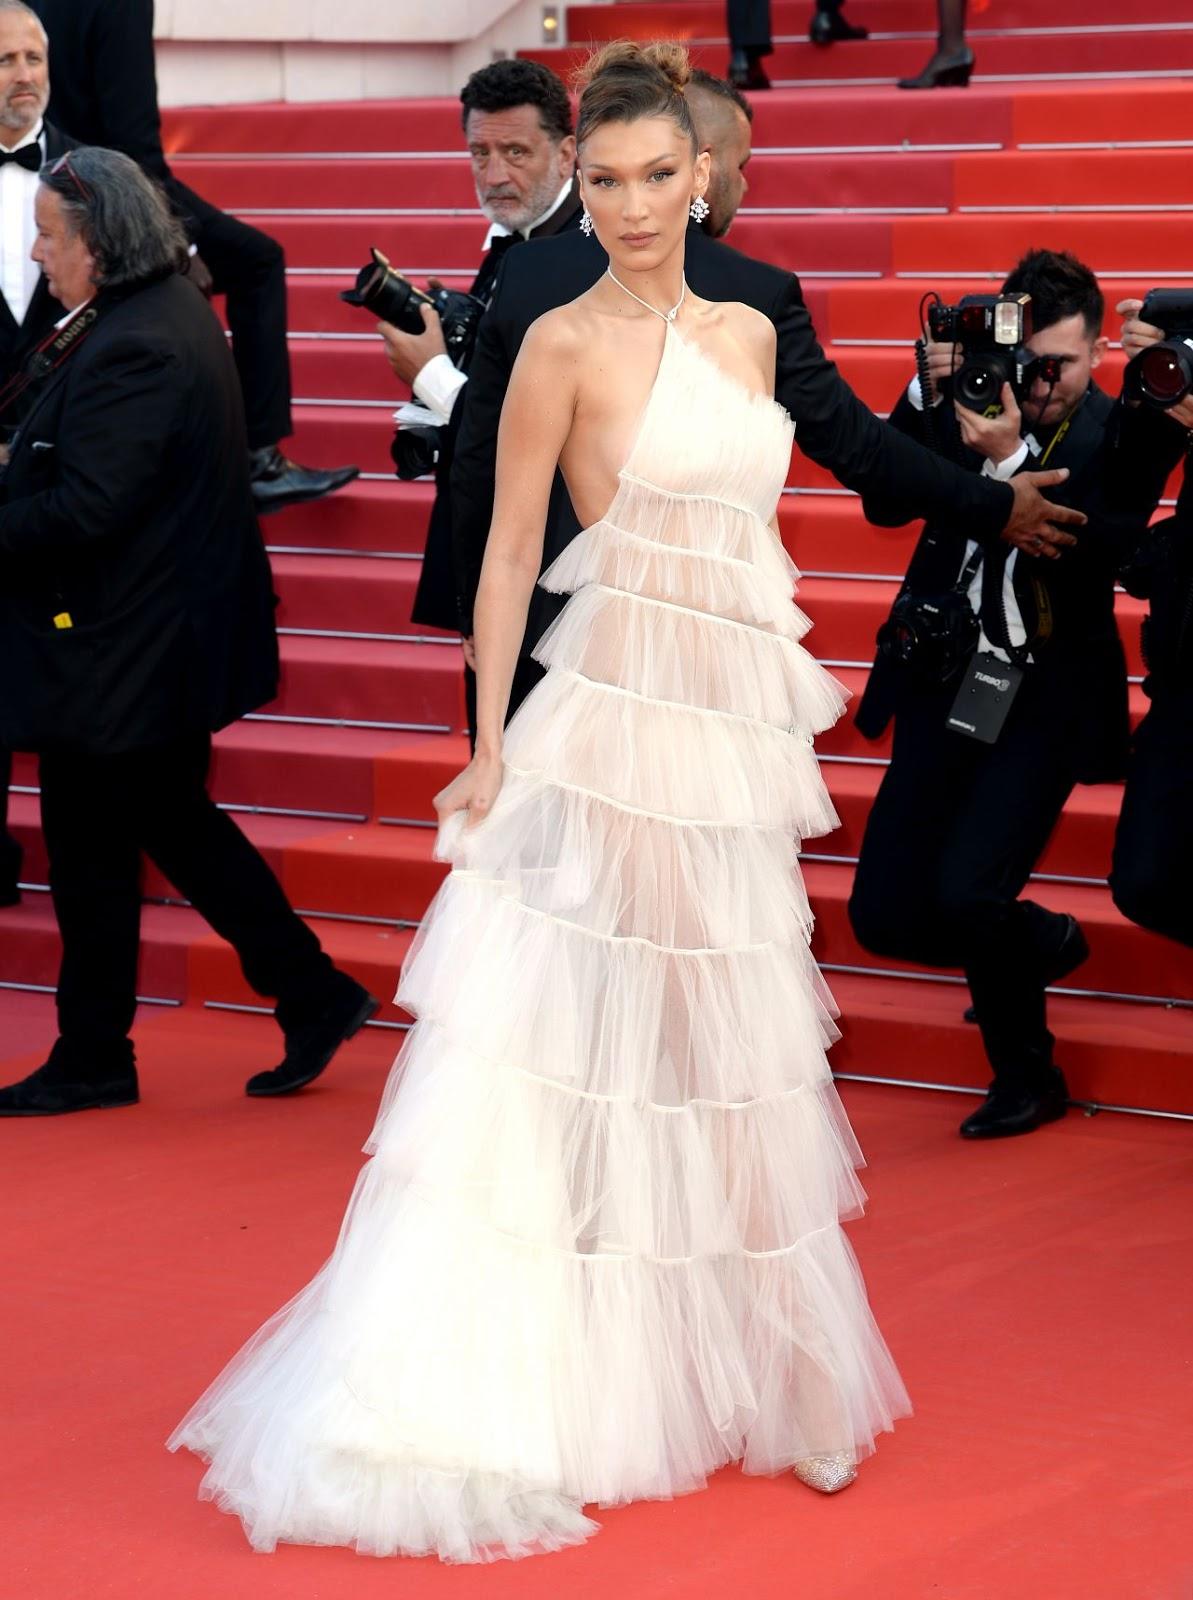 Bella Hadid – Rocketman Red Carpet at Cannes Film Festival